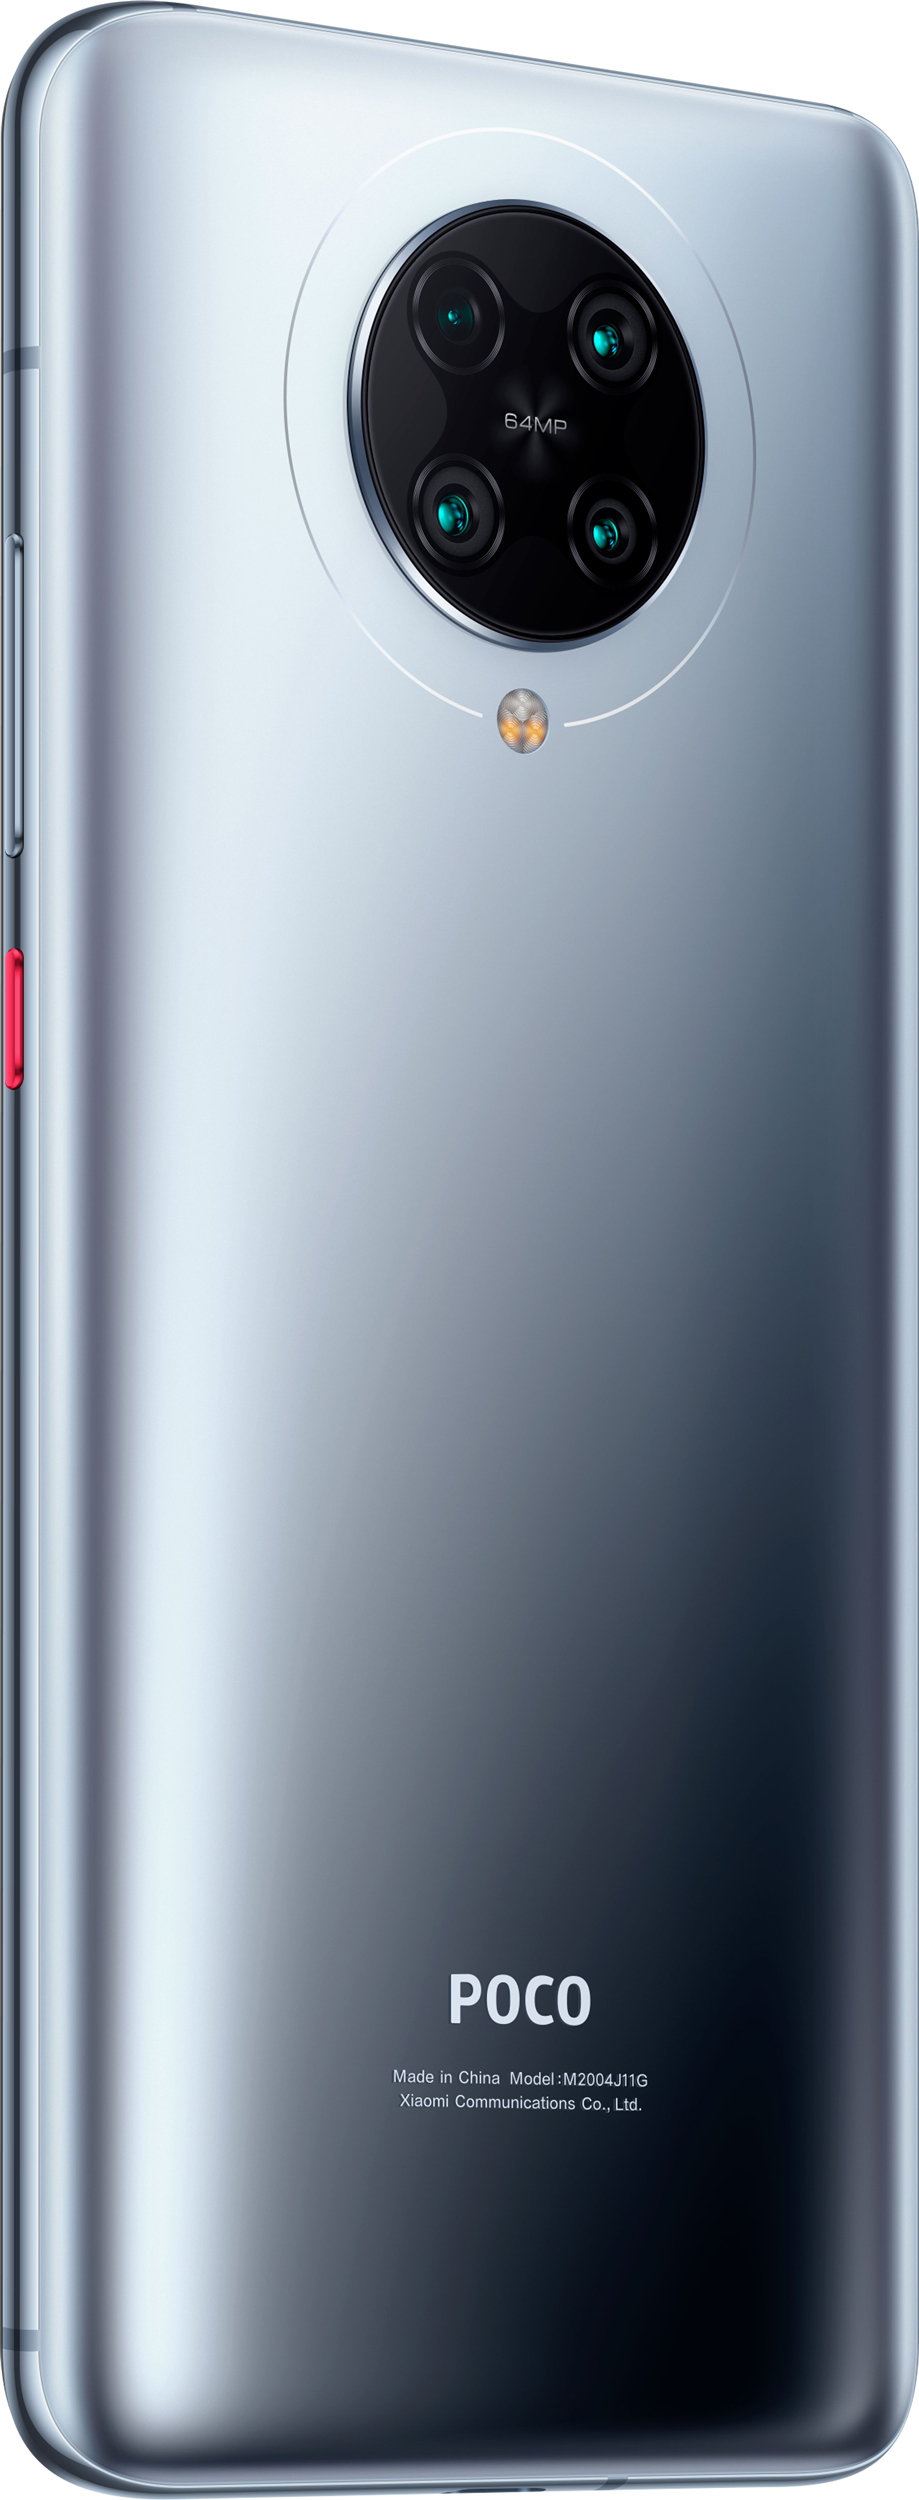 Smartphone POCO F2 Pro - 8+256GB - Gri